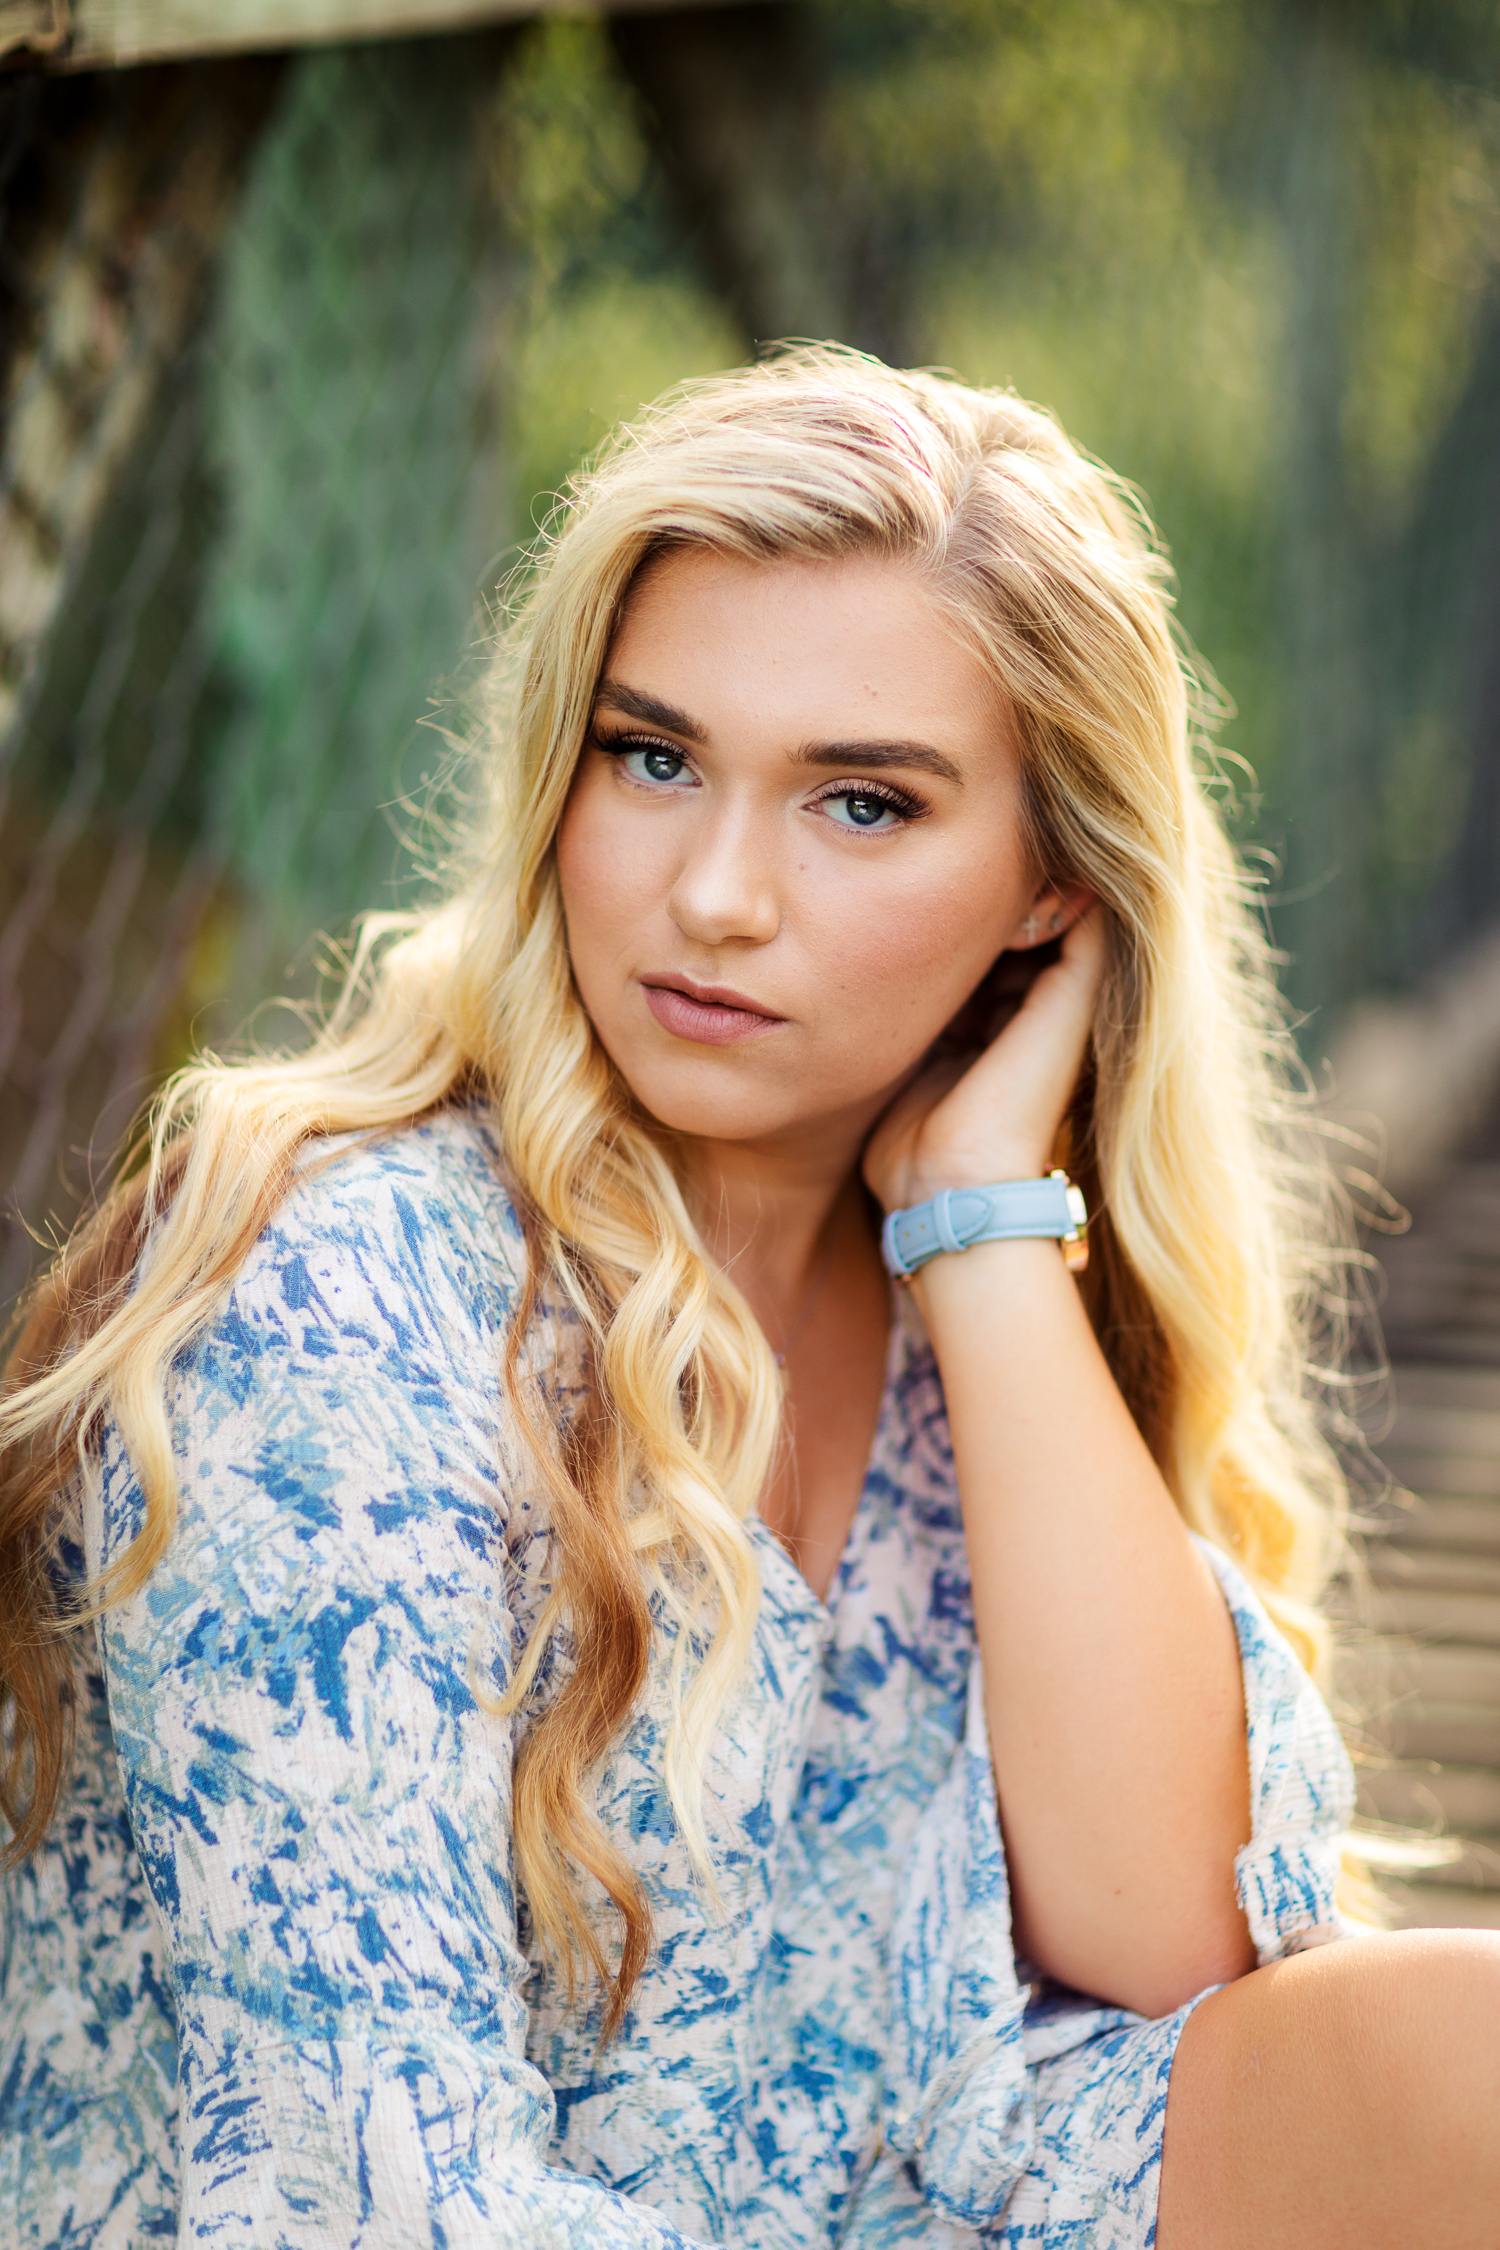 ariellanoellephotography-highschool-senior-portraits-top-seattle-area-photographer-1-16.jpg